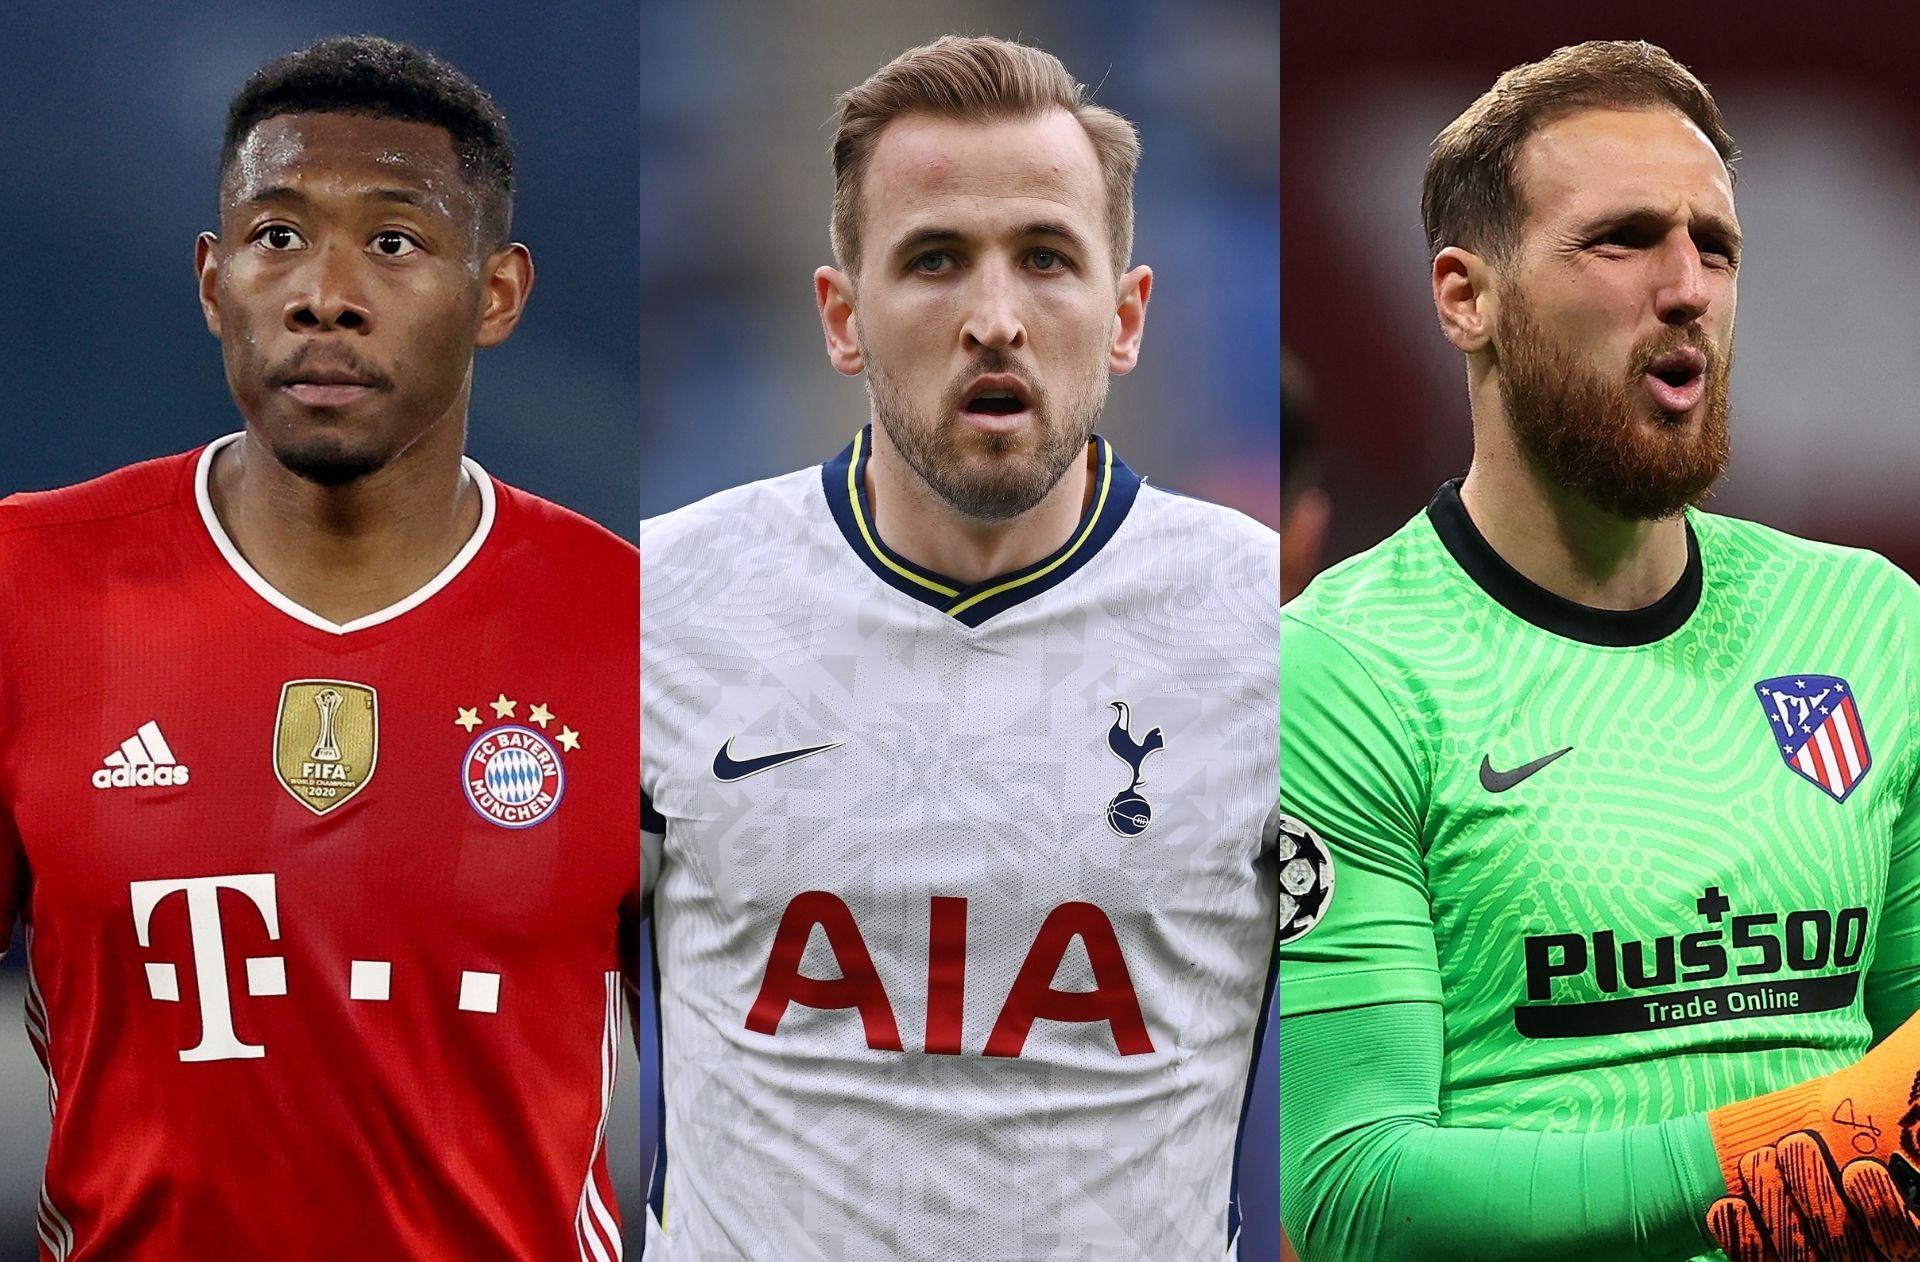 Friday's transfer rumors - Man United's top 4 targets revealed